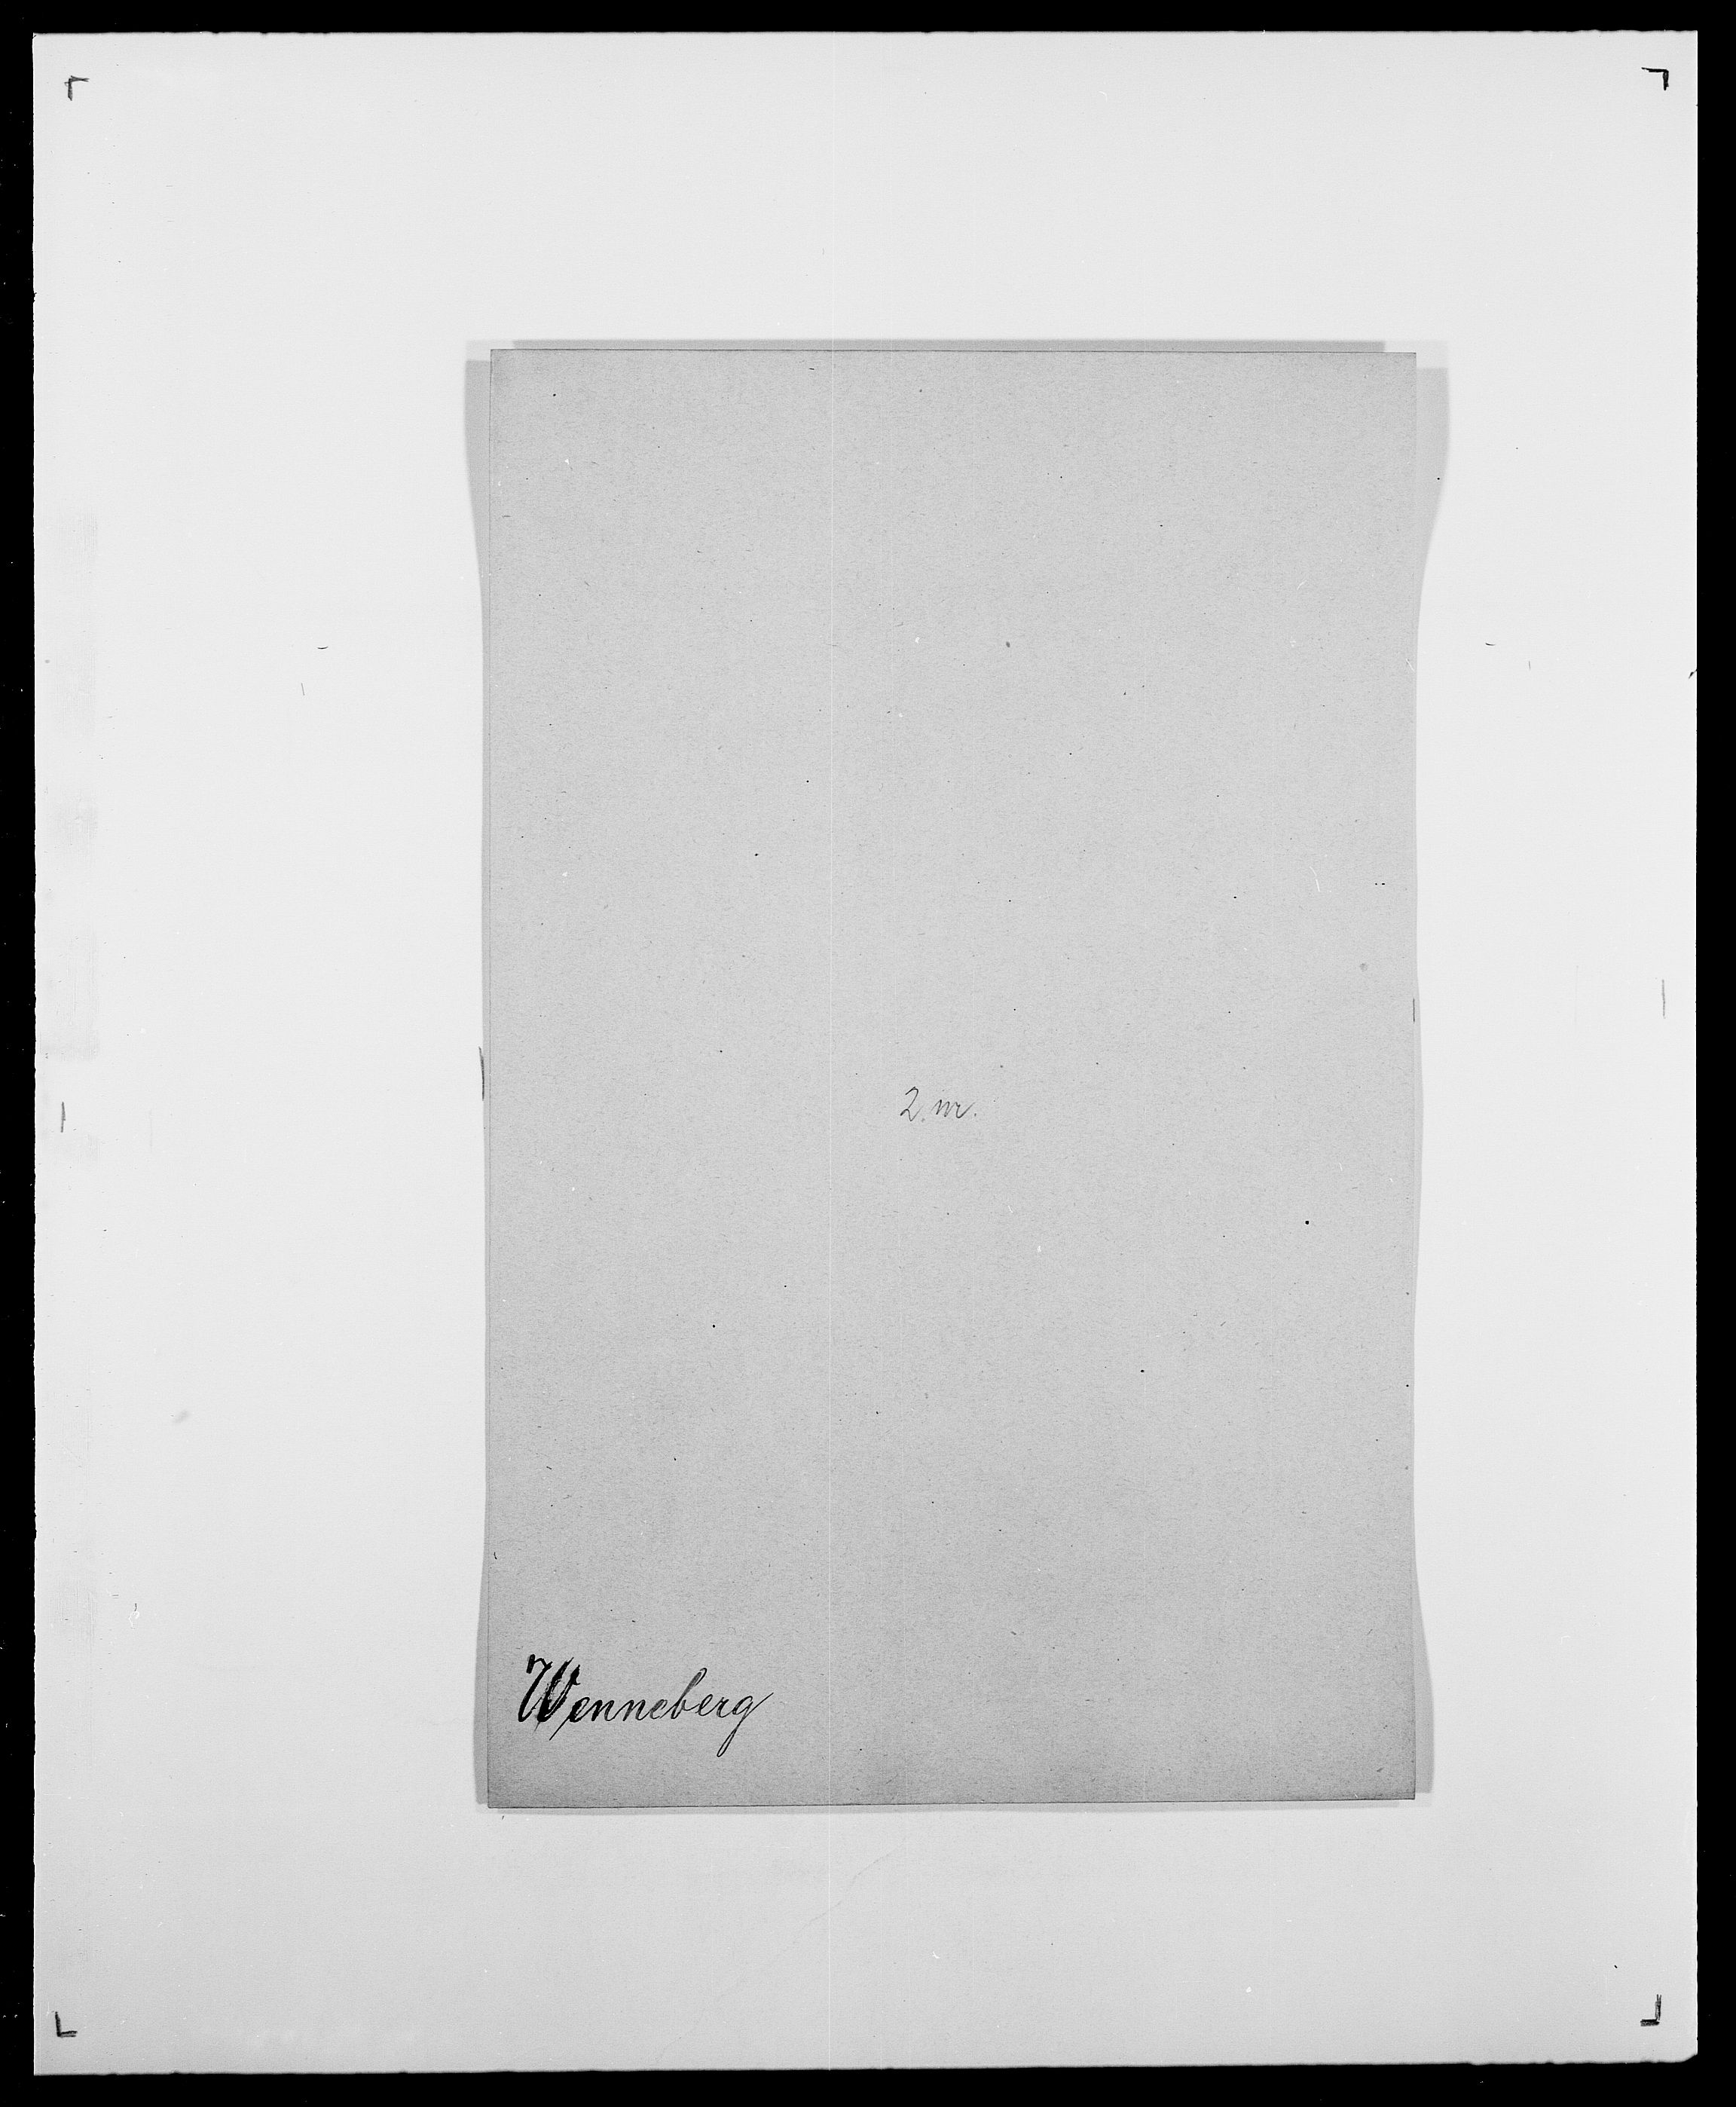 SAO, Delgobe, Charles Antoine - samling, D/Da/L0041: Vemmestad - Viker, s. 34